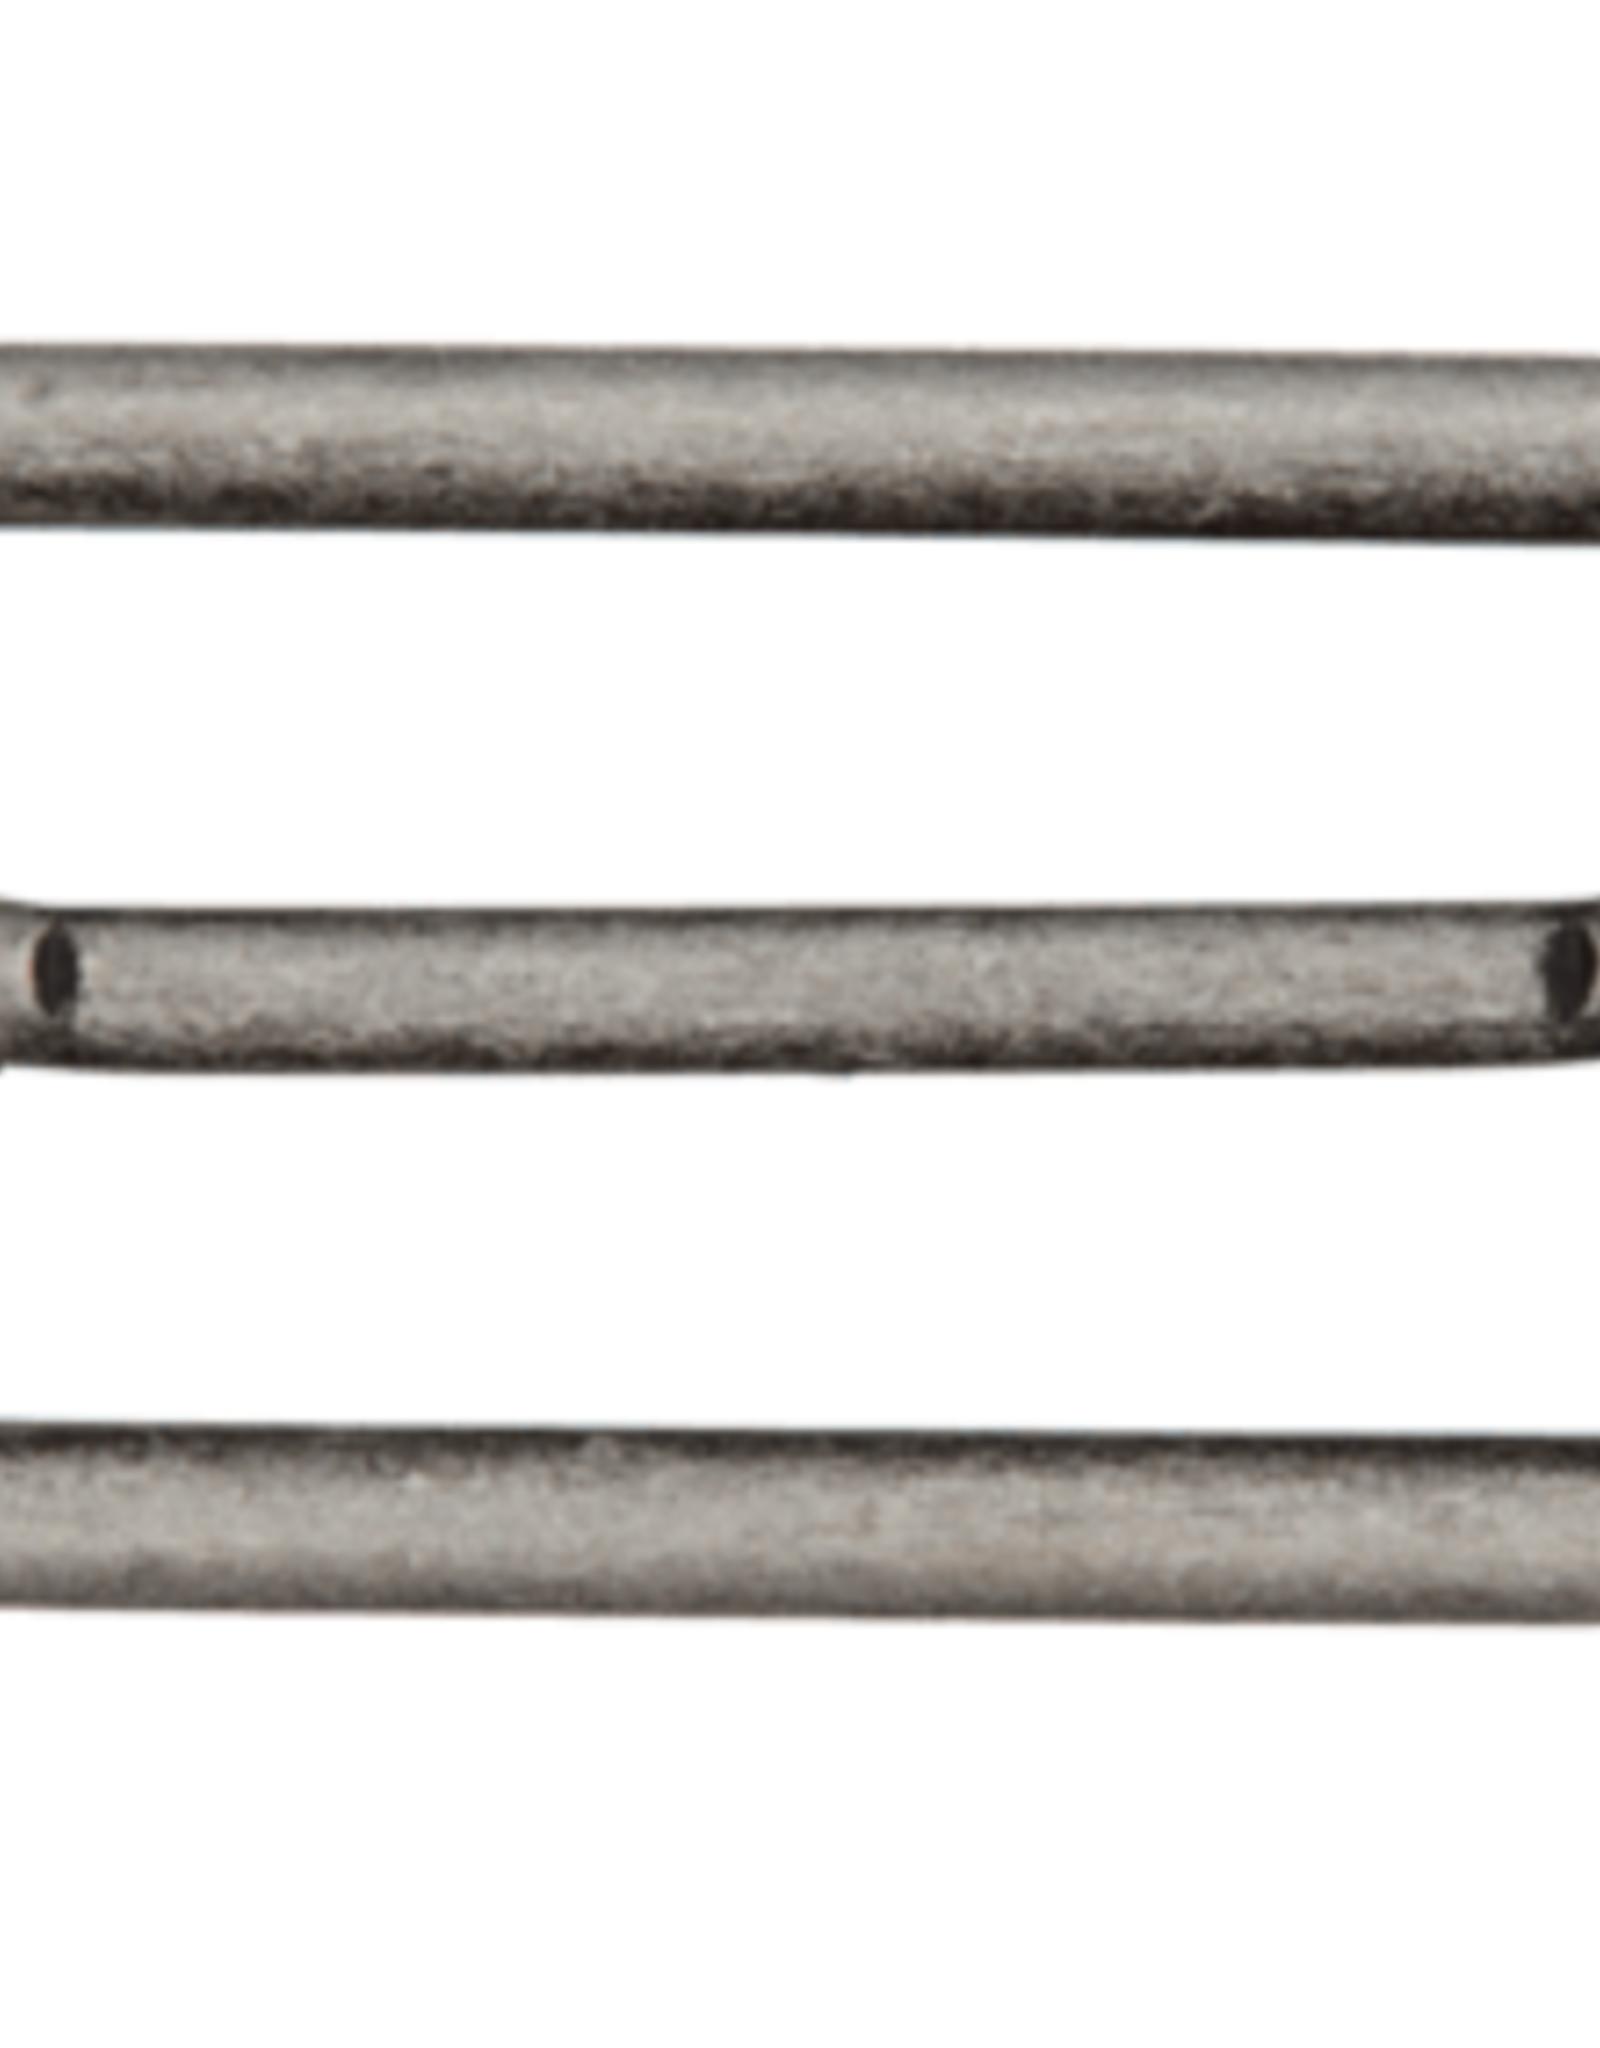 Schuifgesp 25mm - Grijs